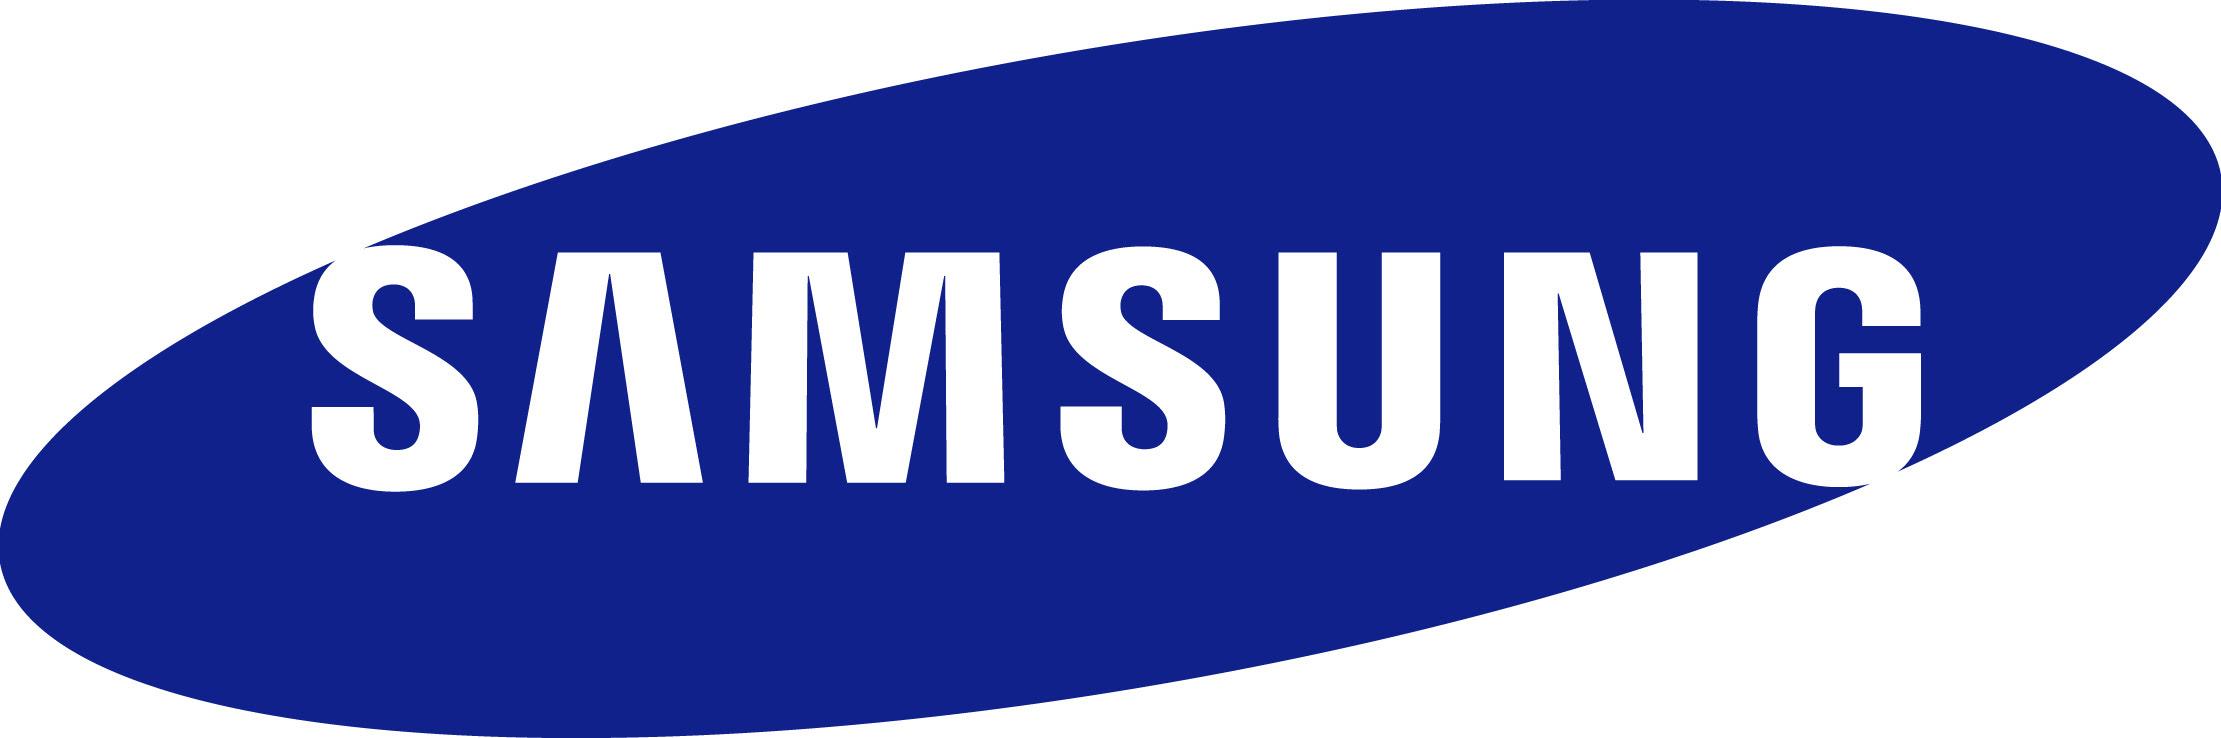 http://www.technologybloggers.org/wp-content/uploads/2012/03/Samsung-Logo.jpg